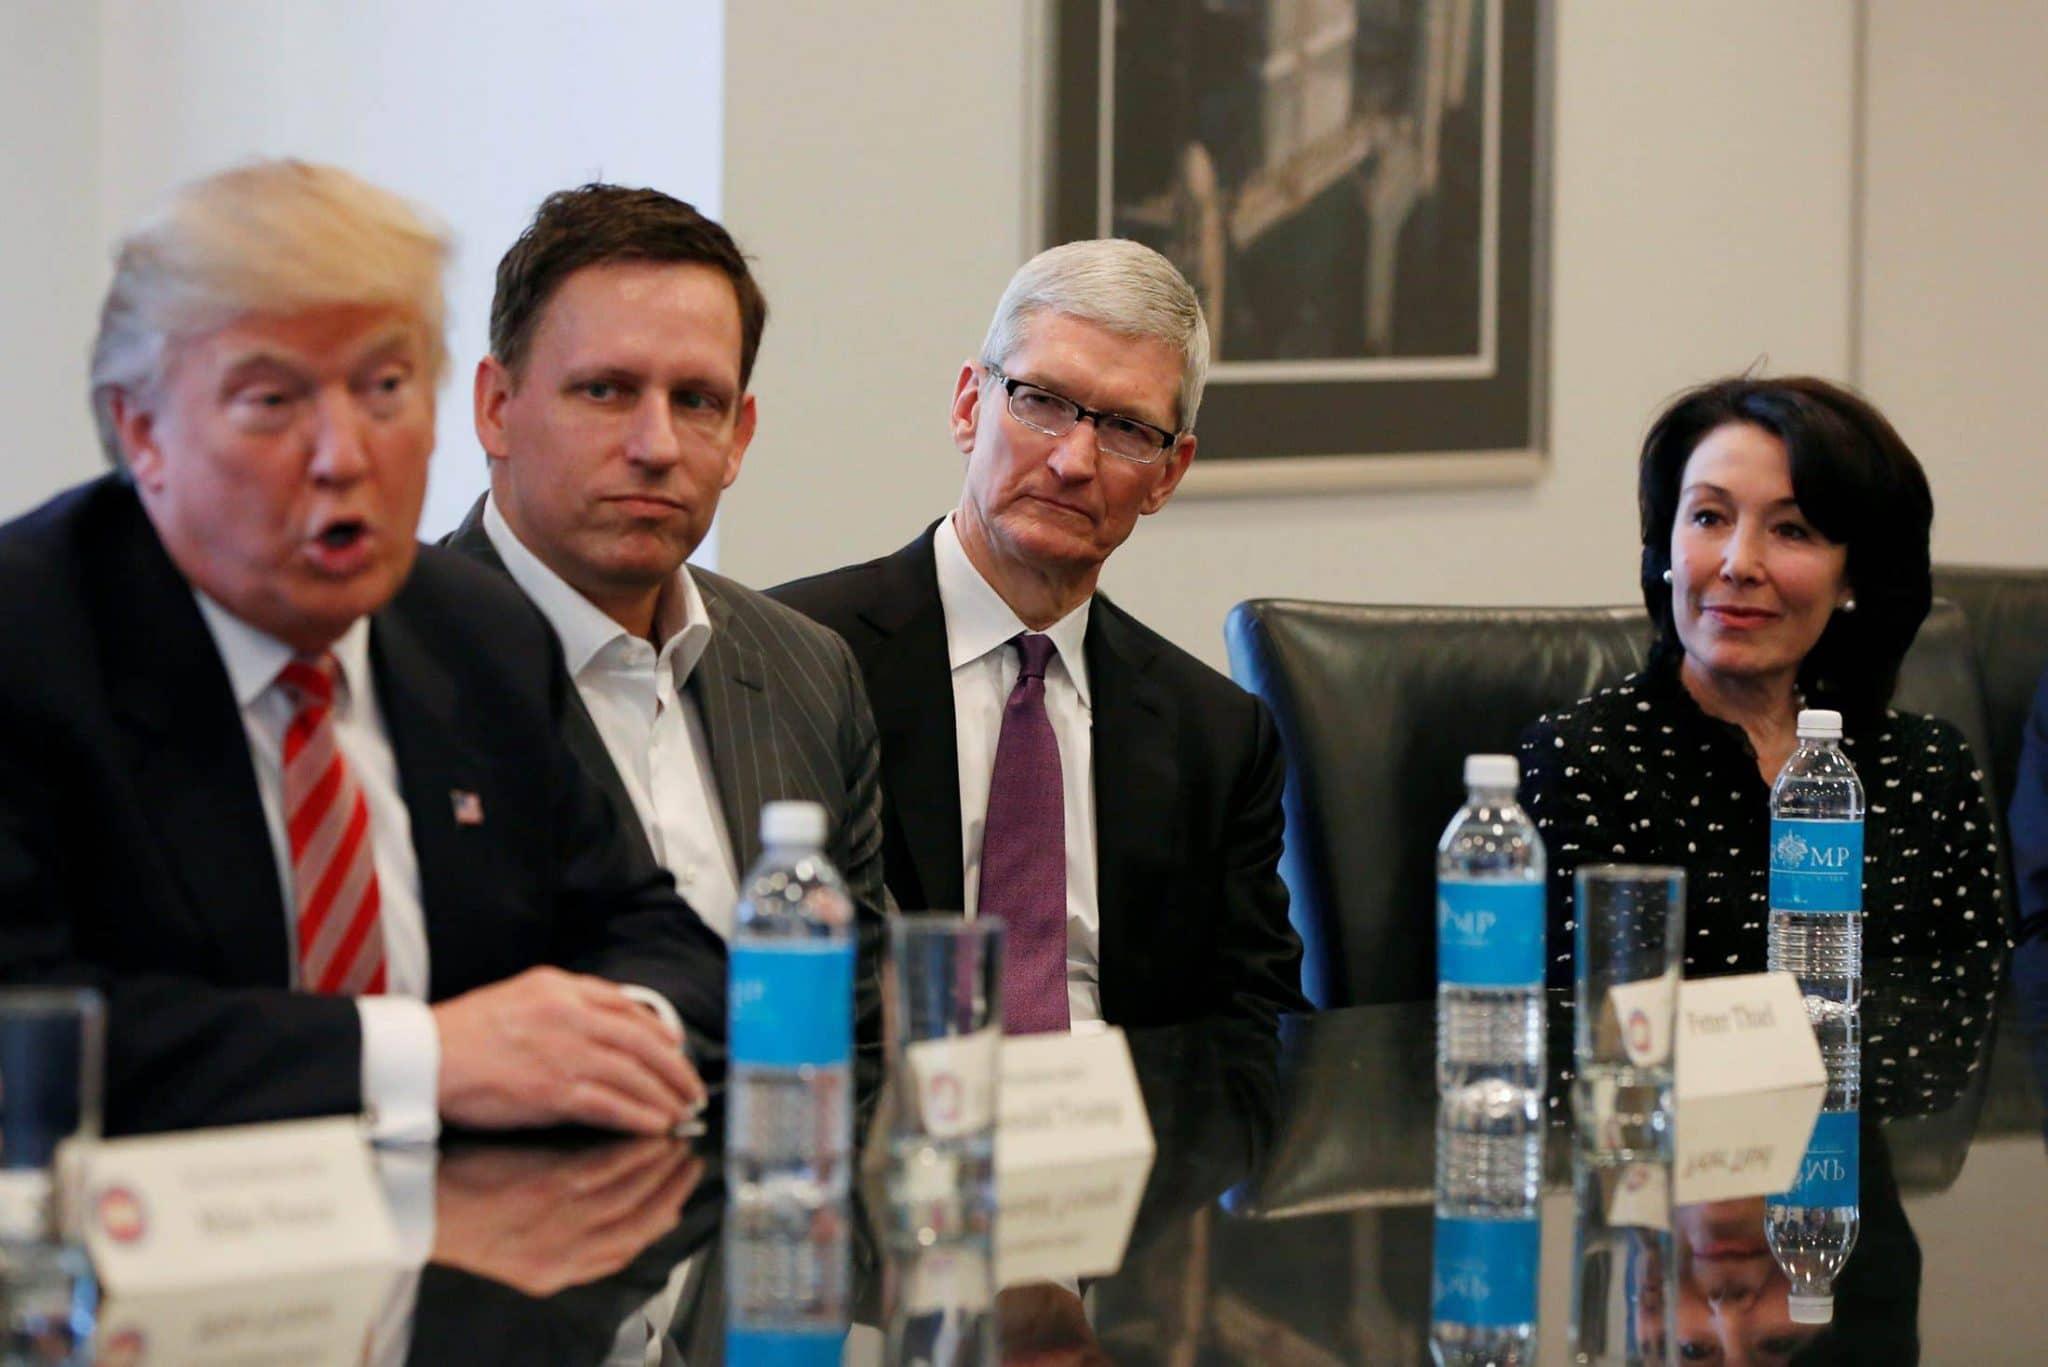 trump cratz meeting apple